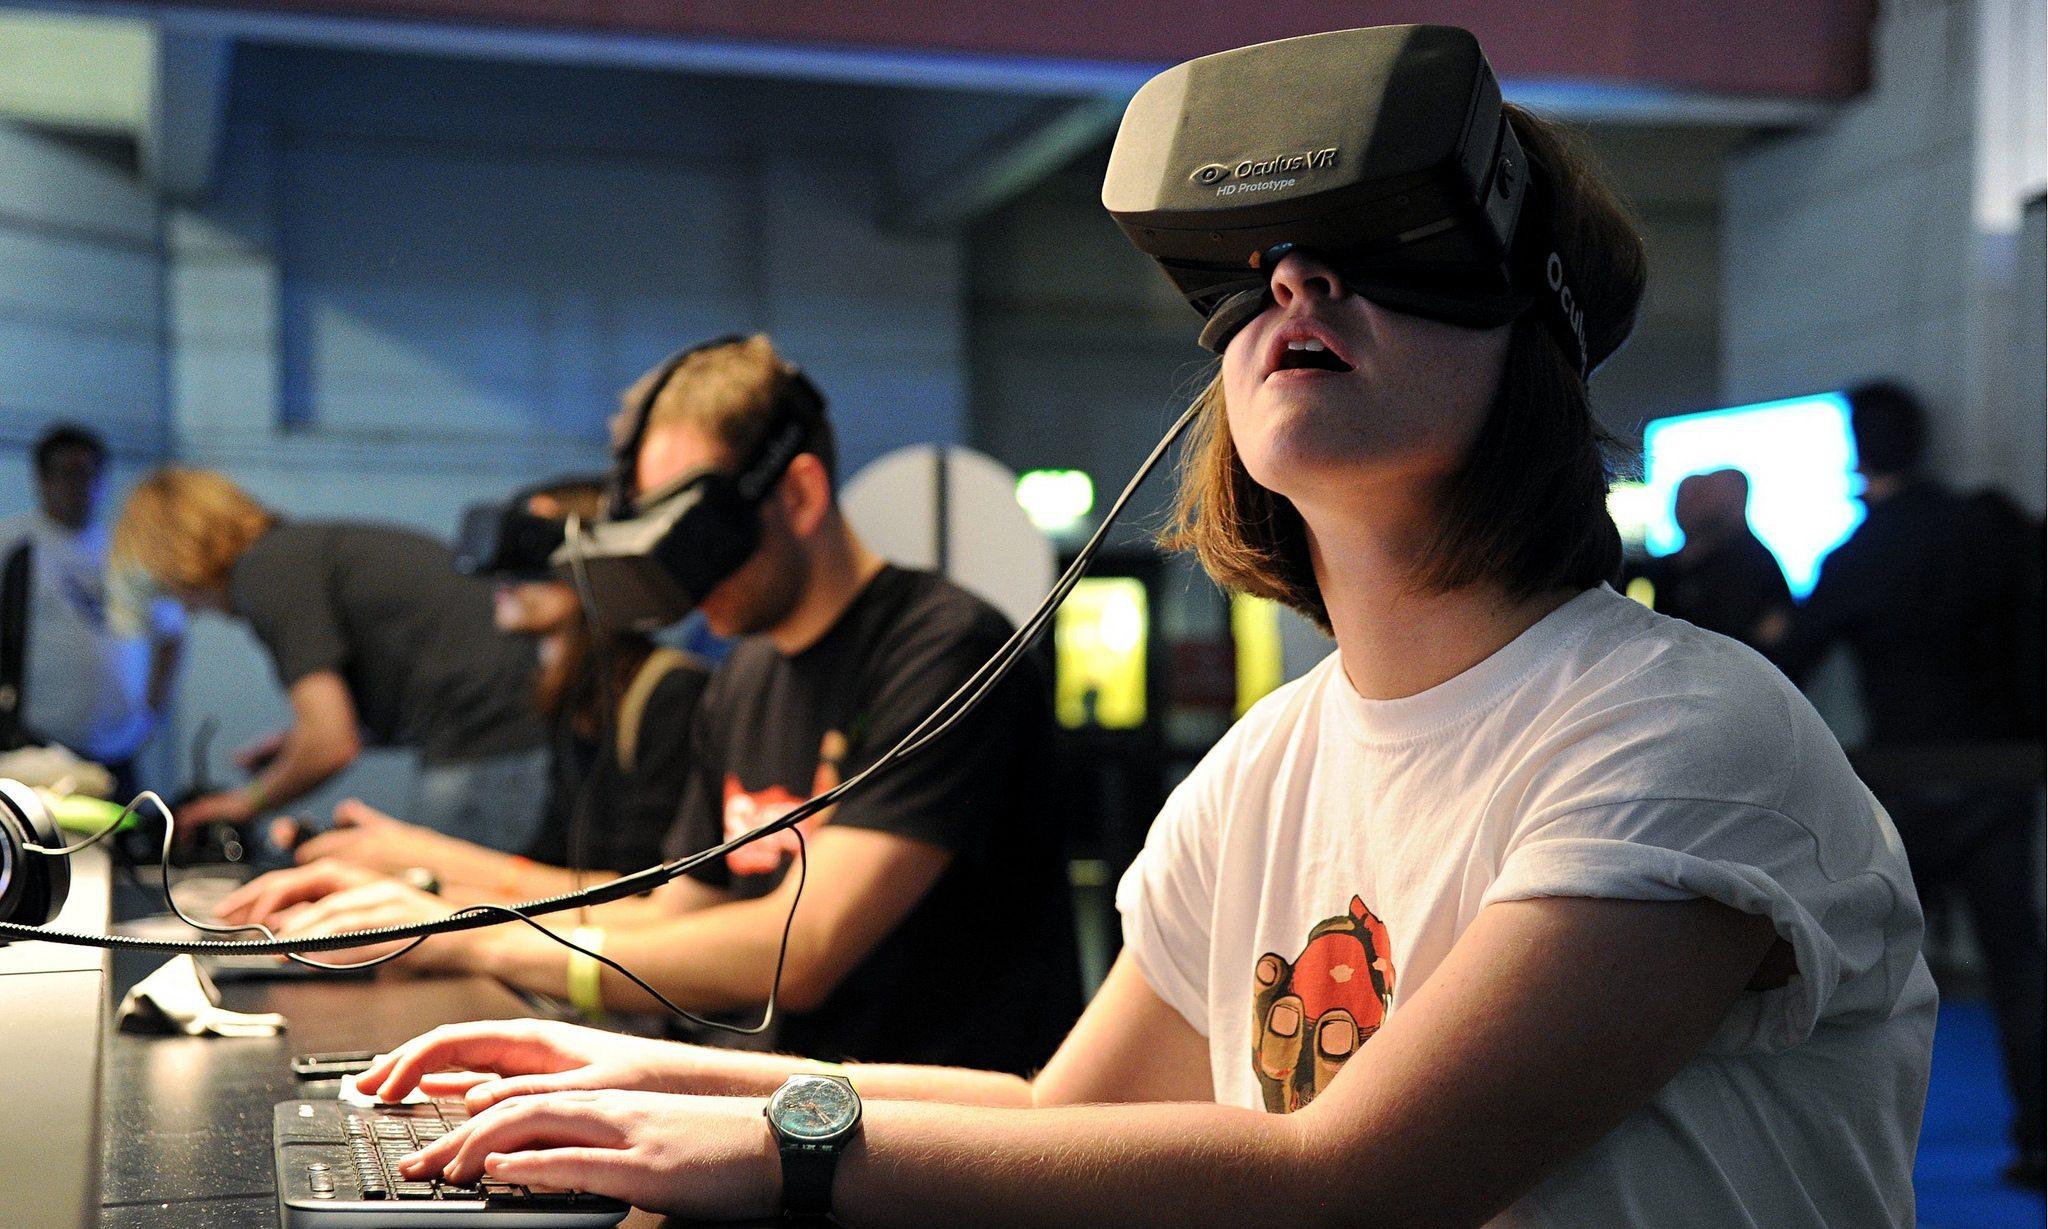 Image: A woman wearing a virtual reality headset